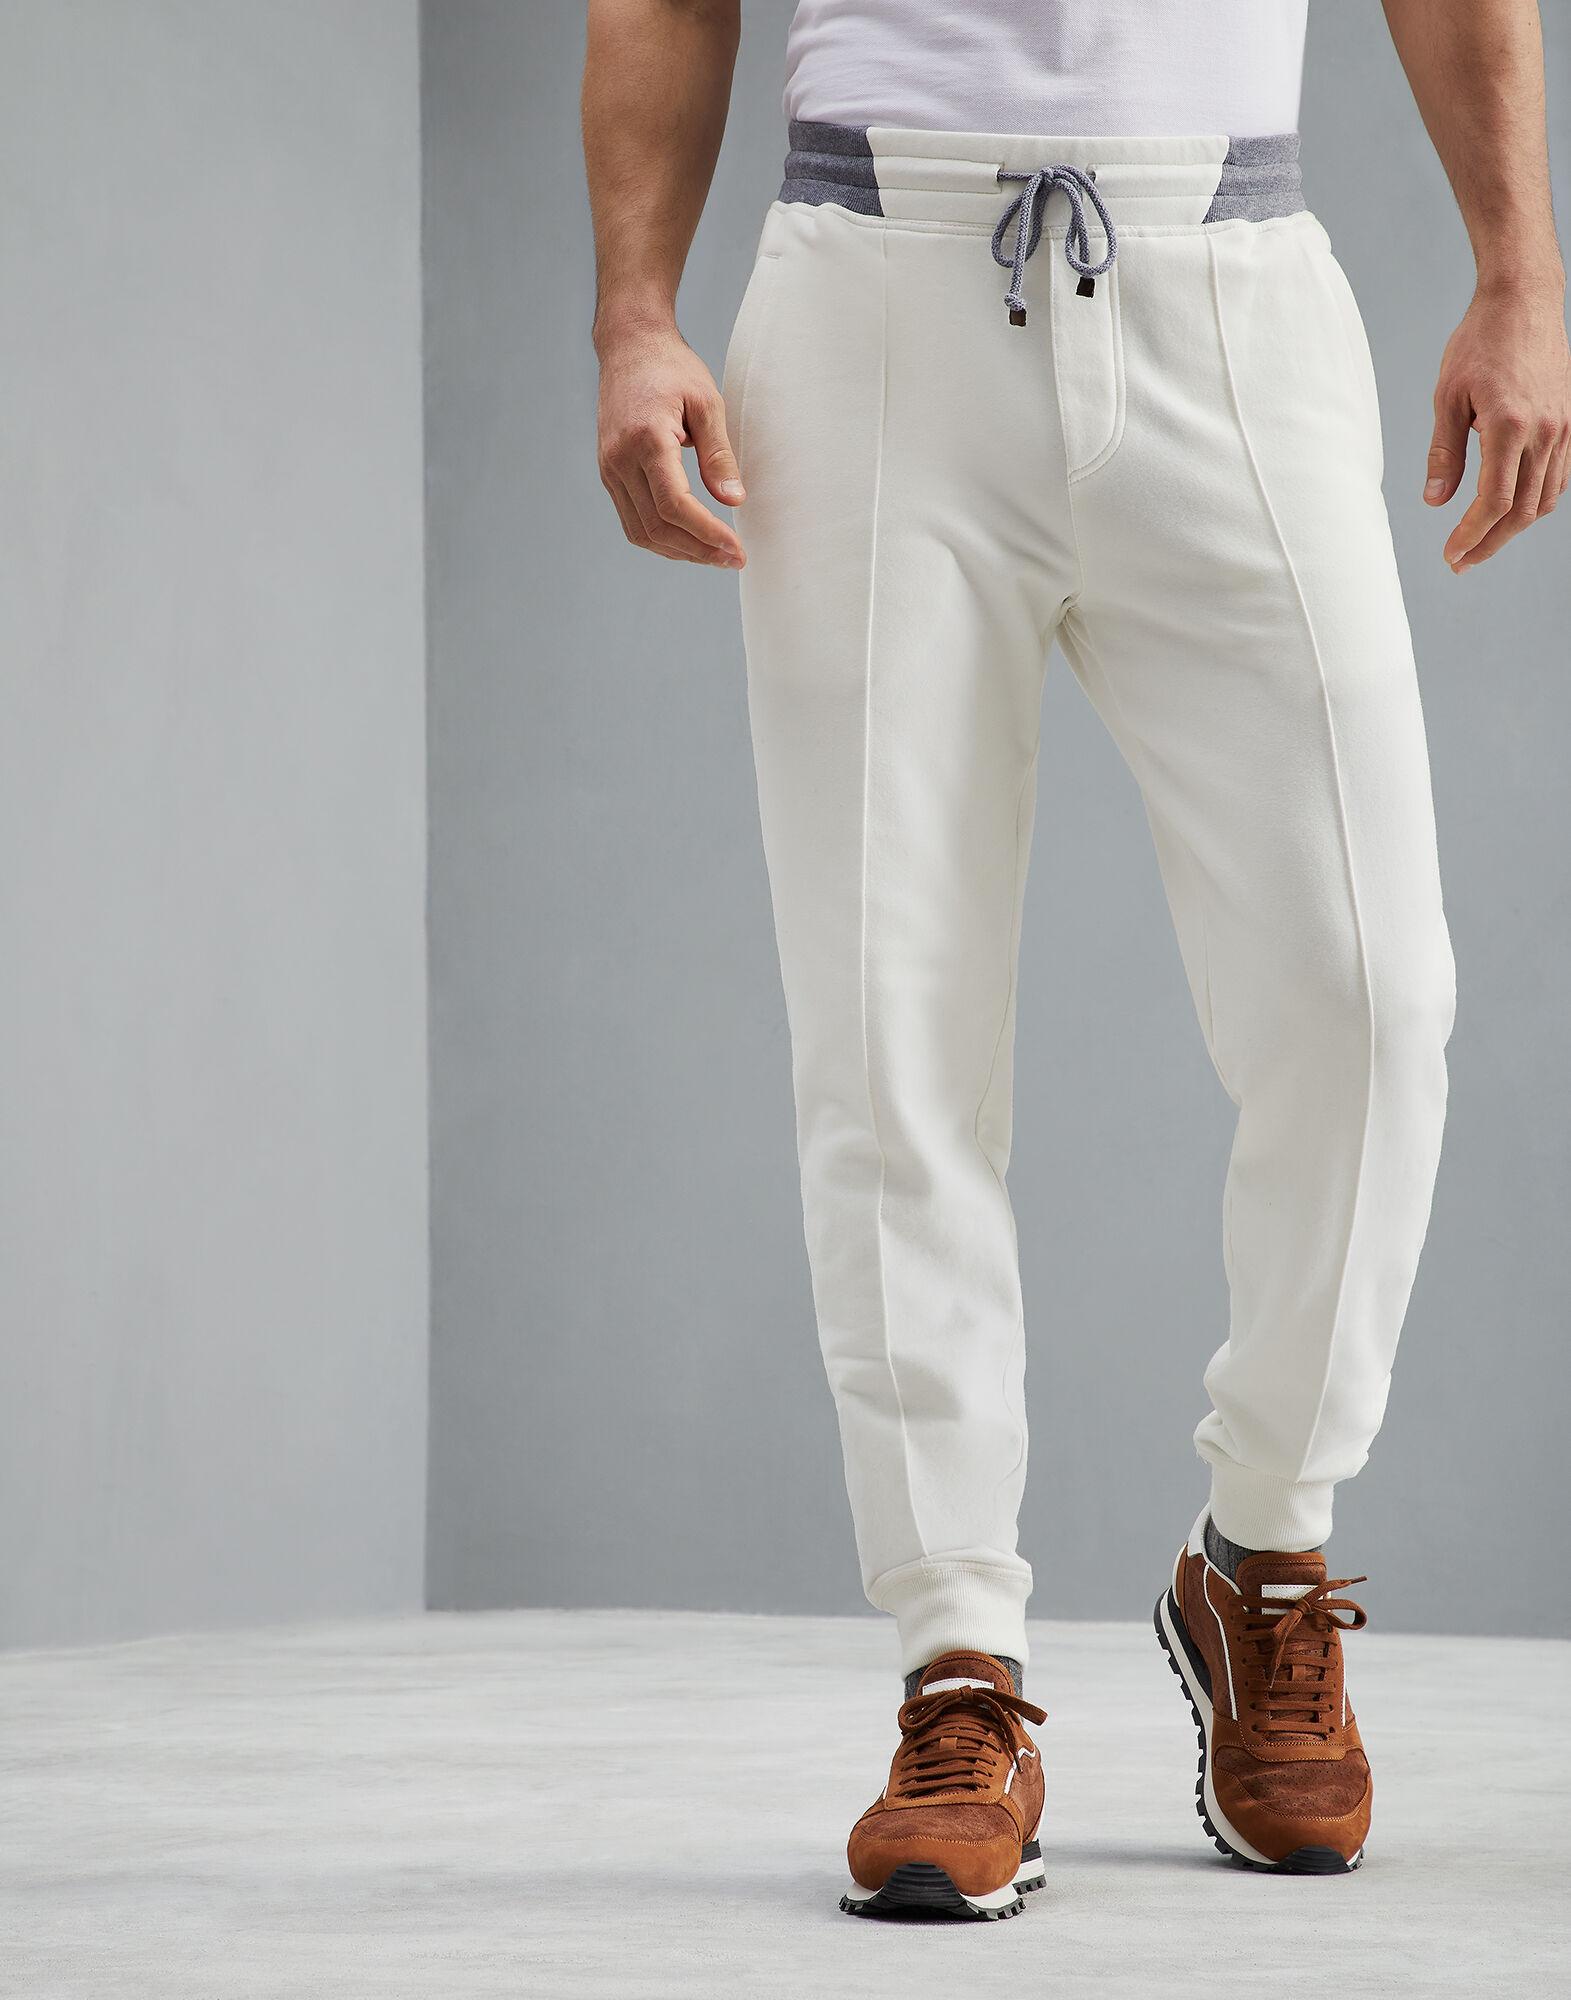 Pantaloni Travelwear Uomo 182m0t153264g Brunello Cucinelli qwnfB1qr